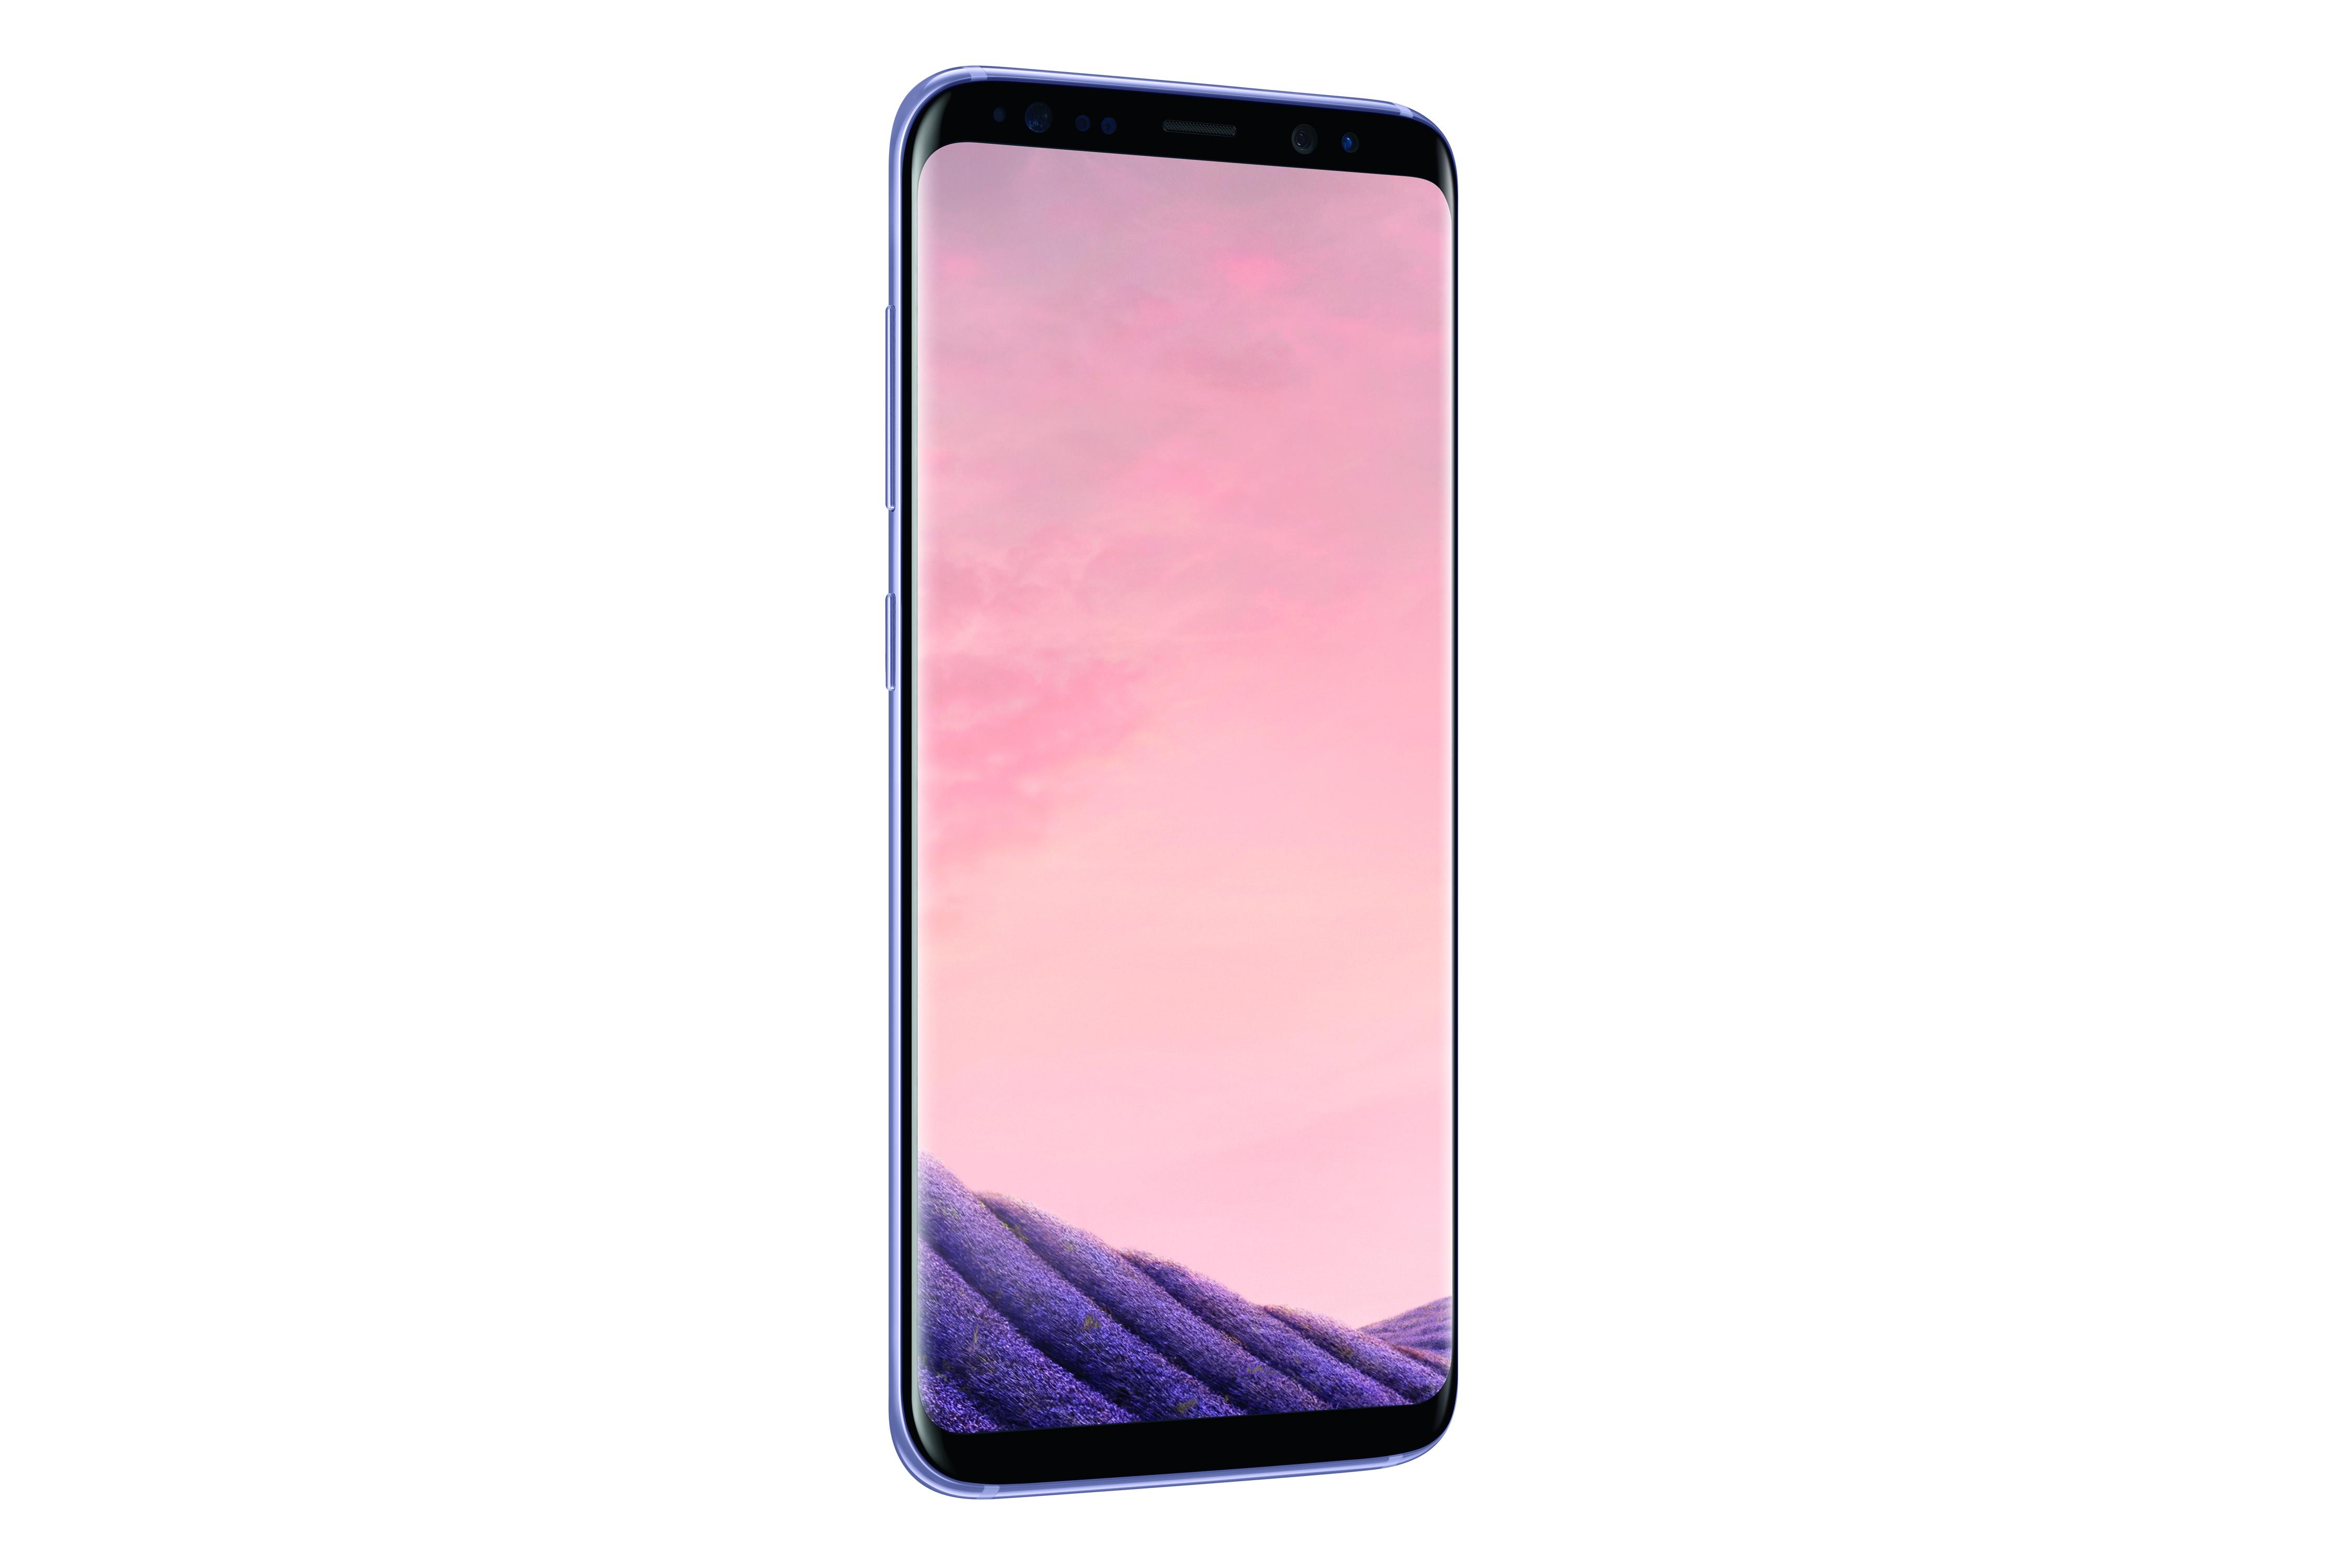 Das neue Samsung Galaxy S8 SM-G950F in Orchideen-Grau